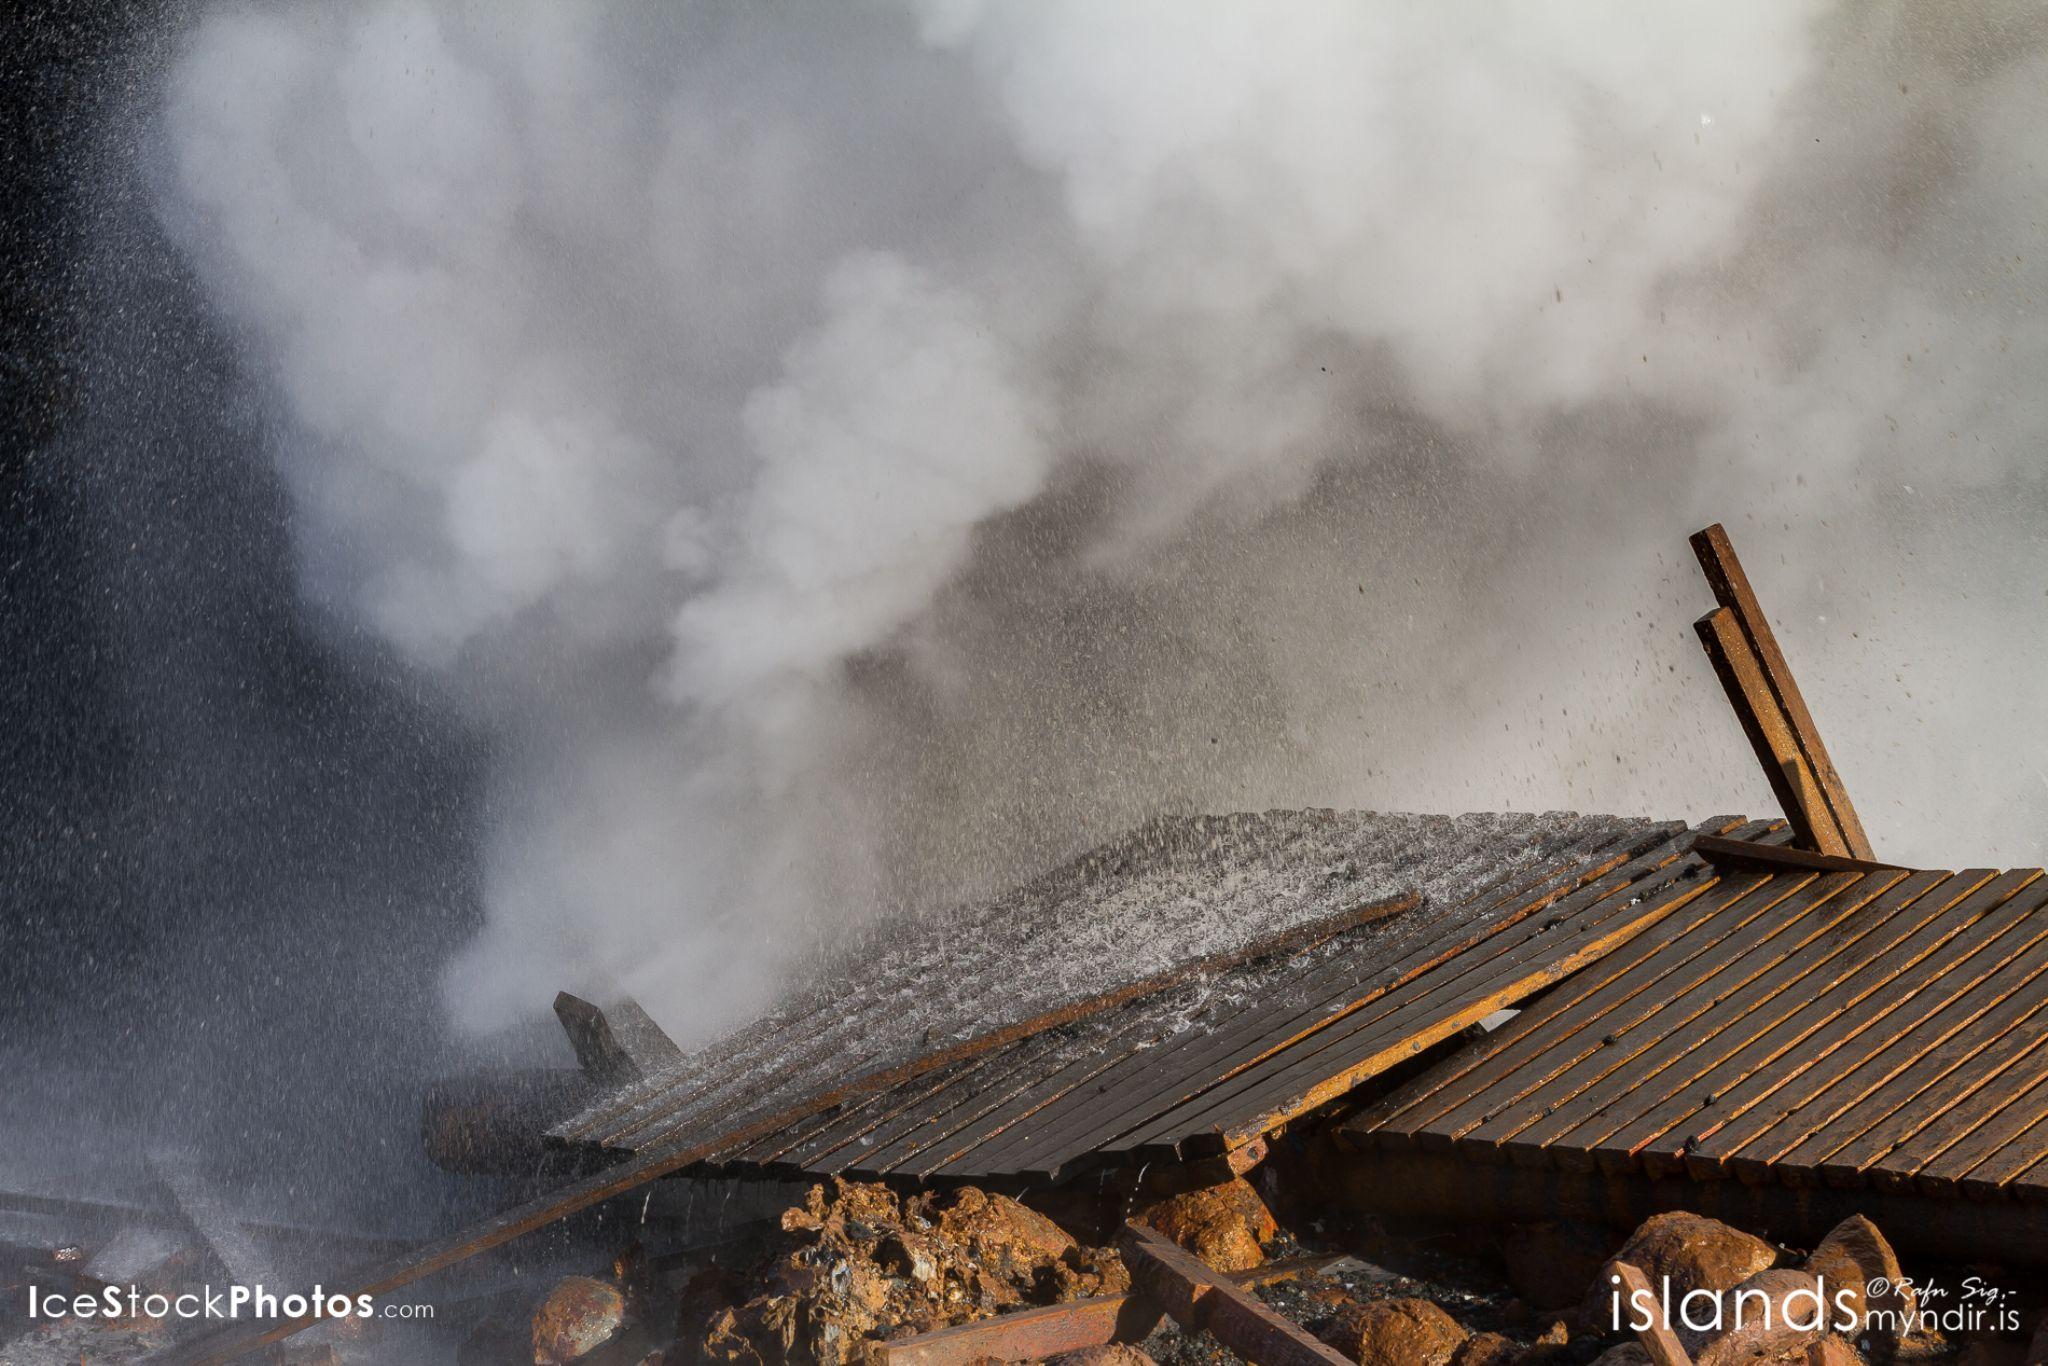 """Gunnuhver (Geyser) is rising so take care"" - #Iceland by Rafn Sig,-  @ Discover Wild Iceland.com"